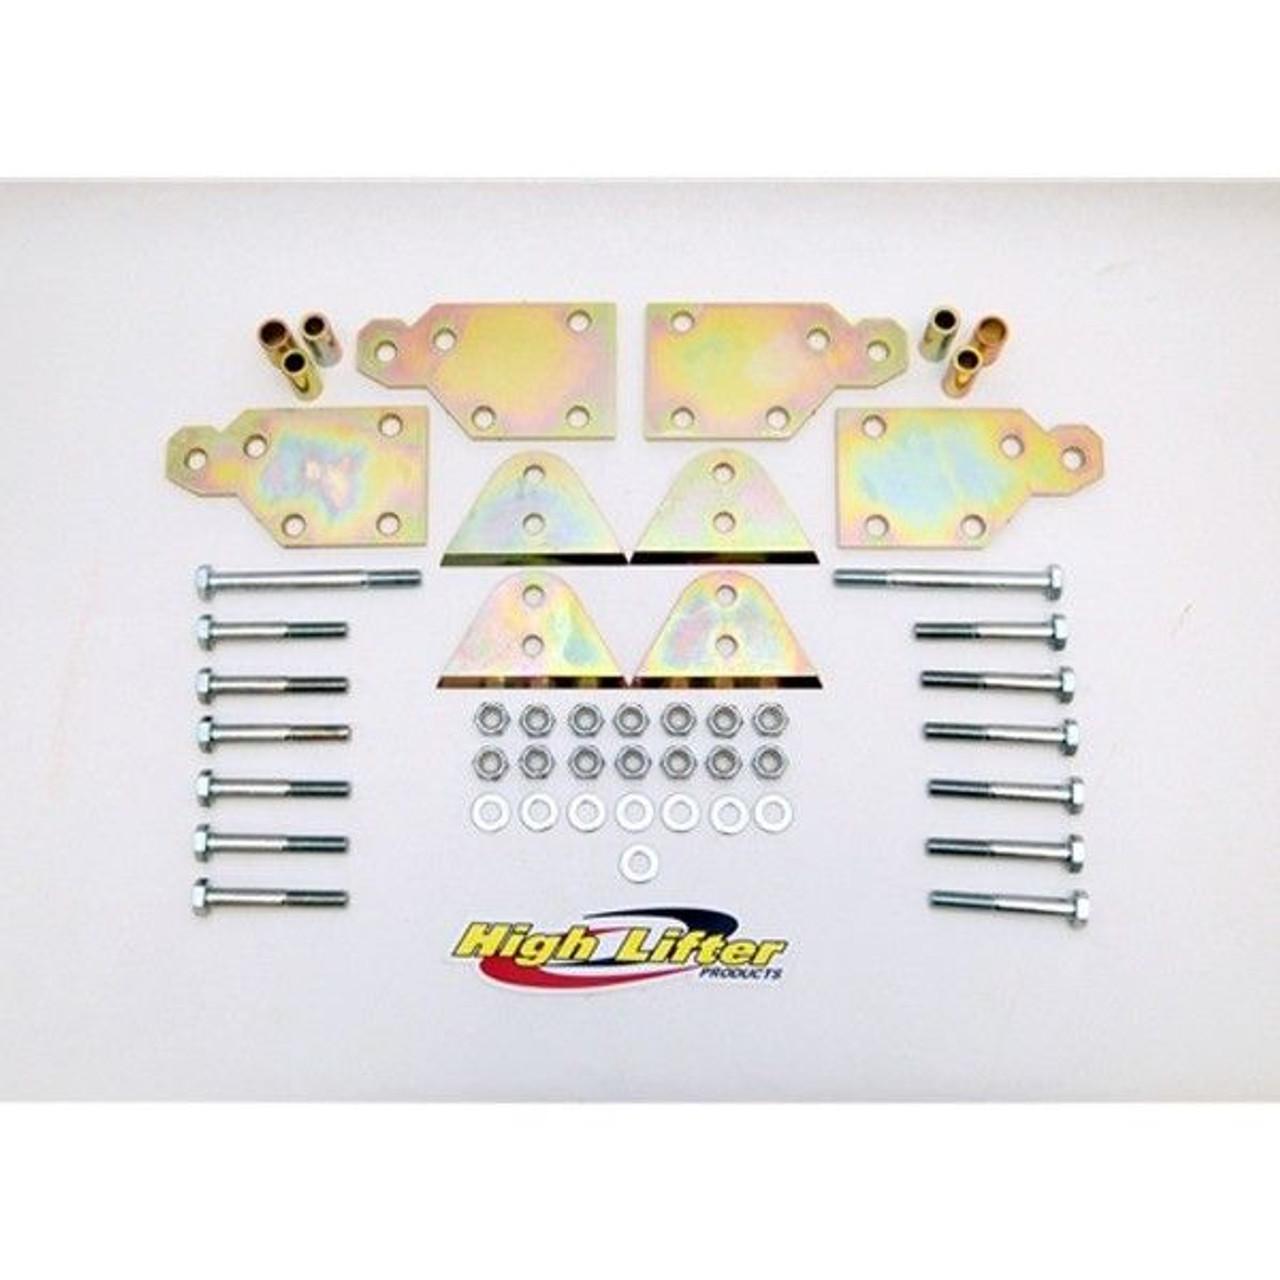 "Polaris RZR 800 2007-2008 PLK800RZR-00 High Lifter Lift Kit 2/"" Signature Series"